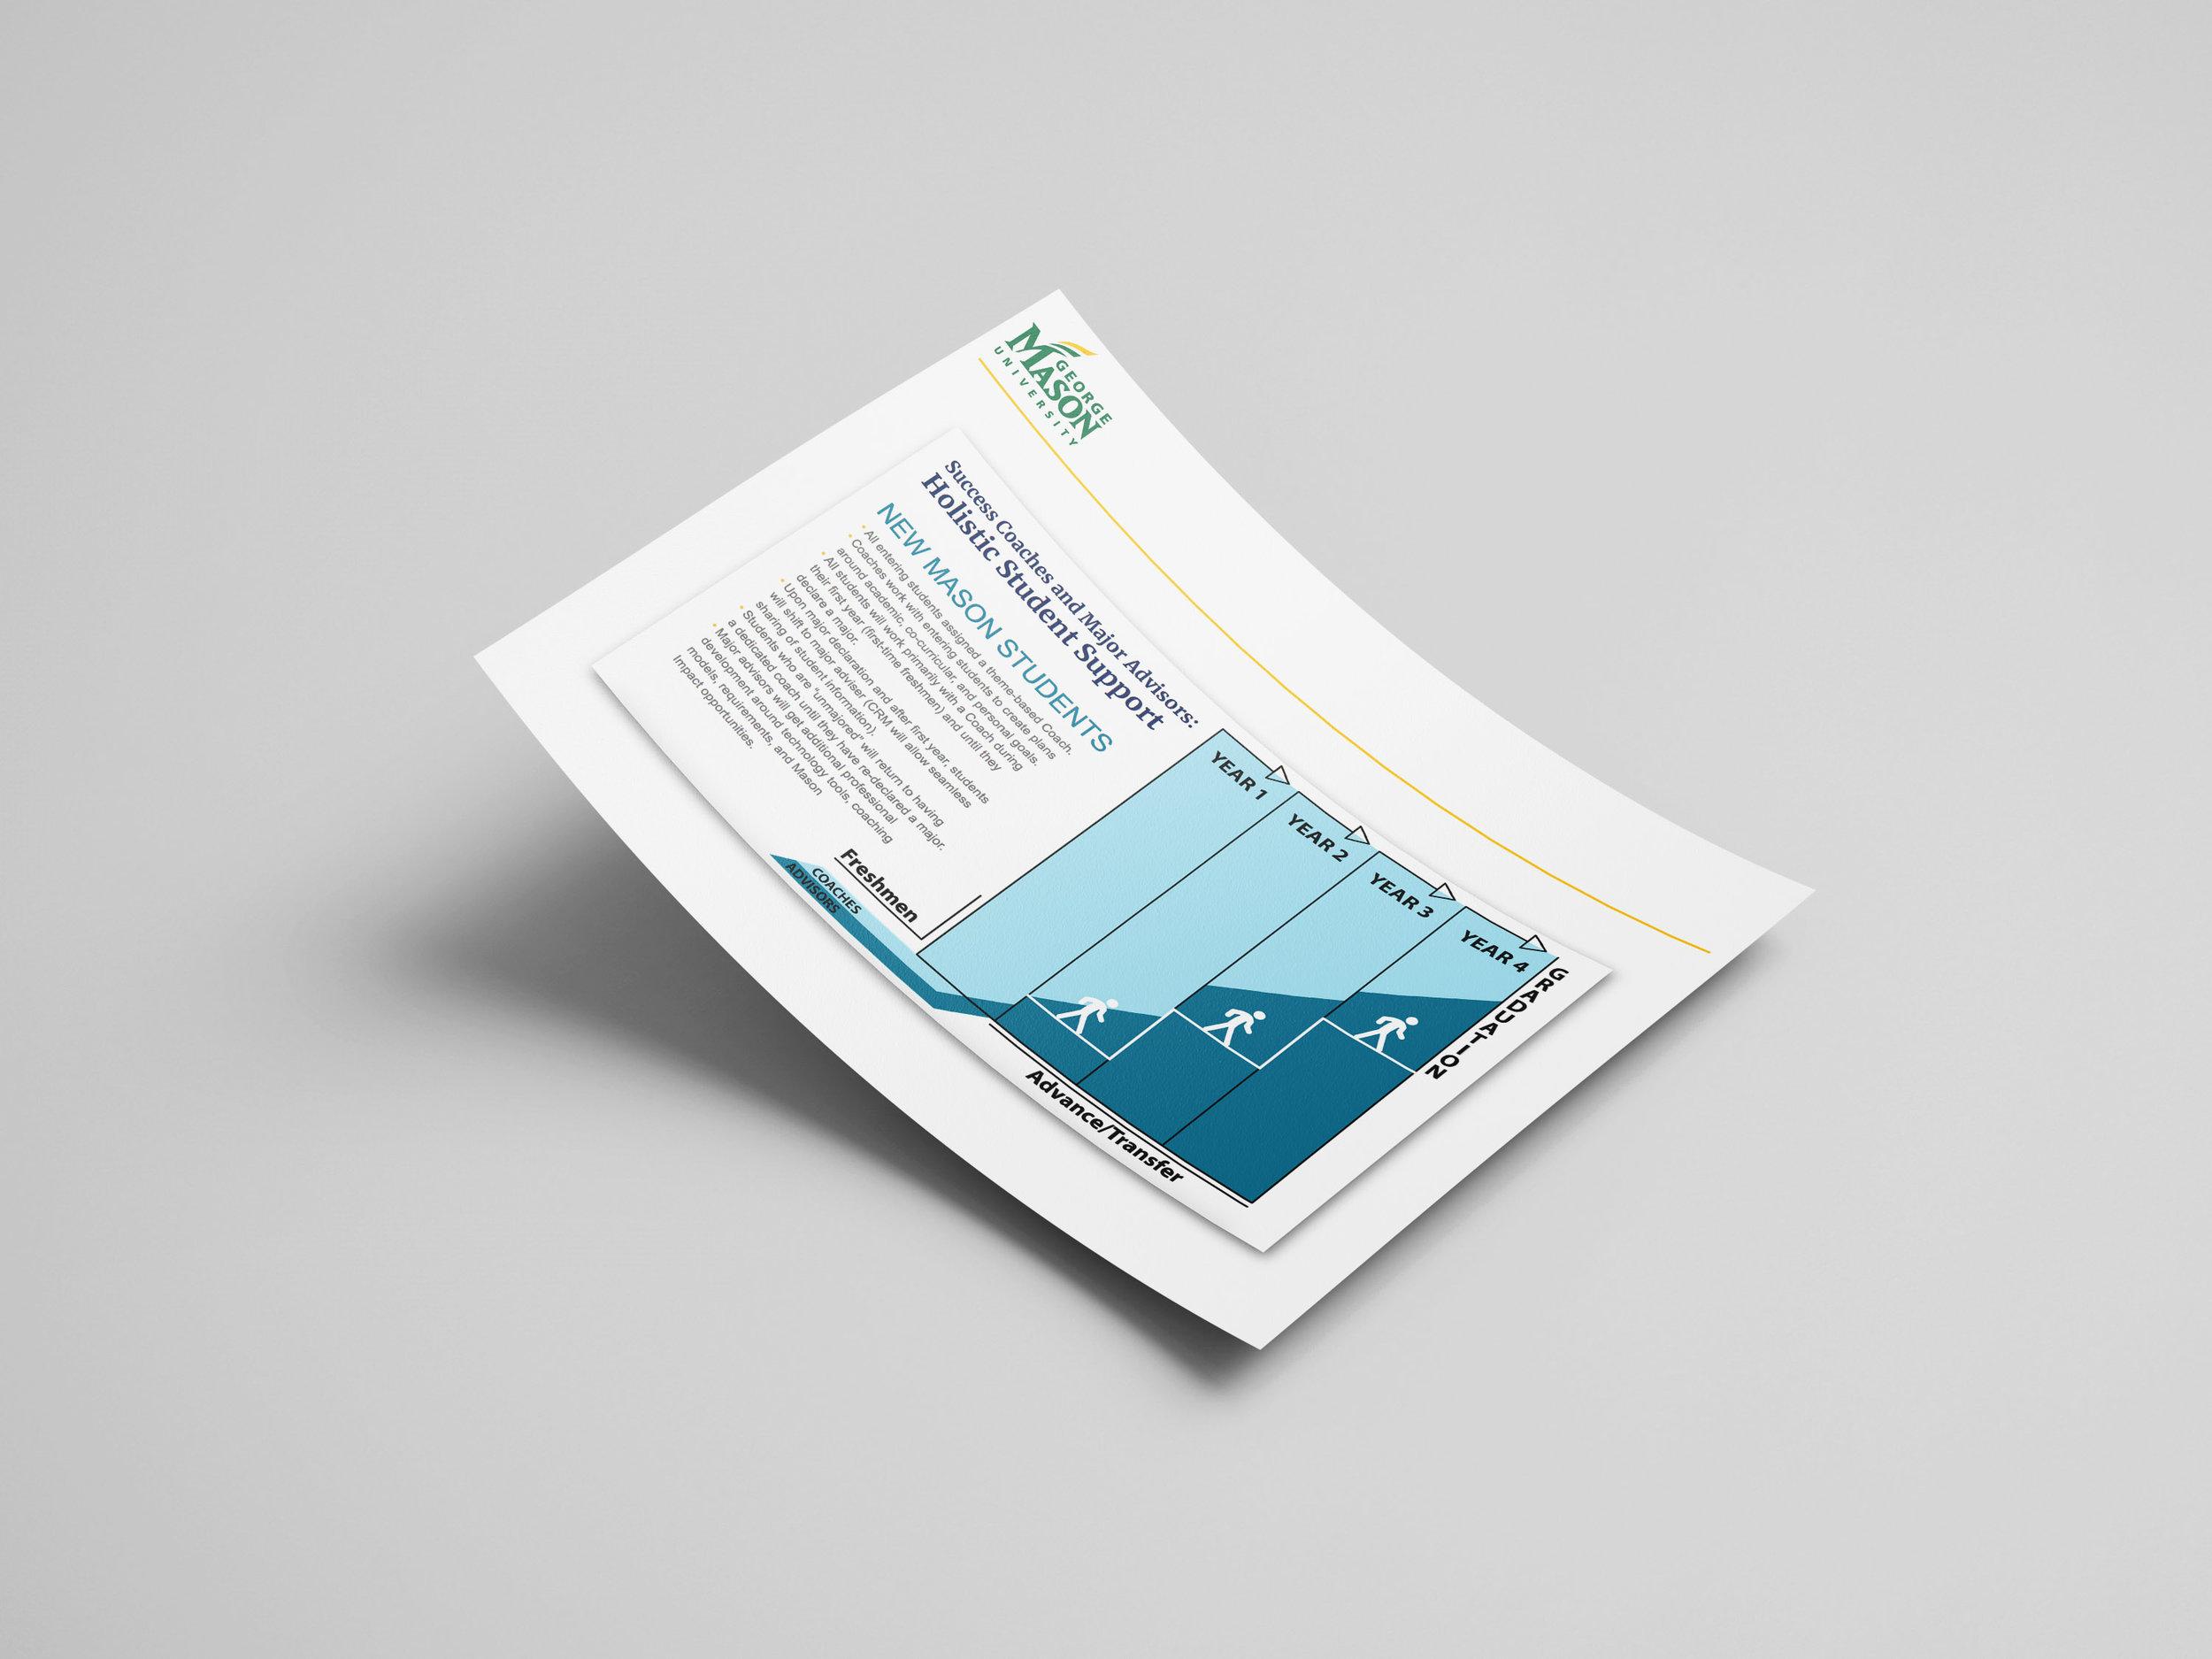 GMU_Infographic_Mockup.jpg